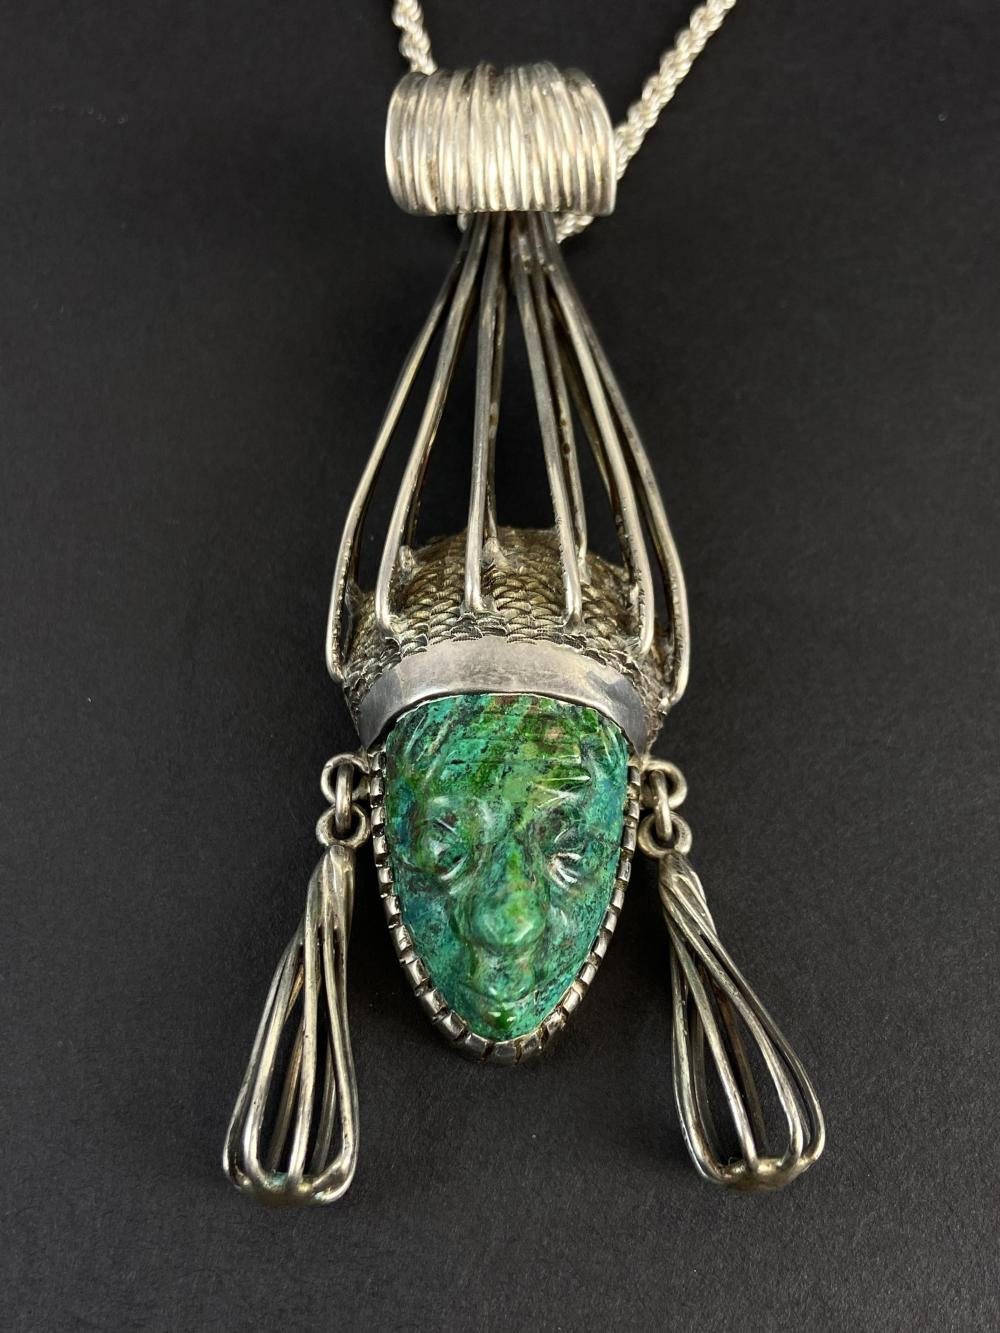 Mid Century Cecilia Of Taxco Pendant Necklace